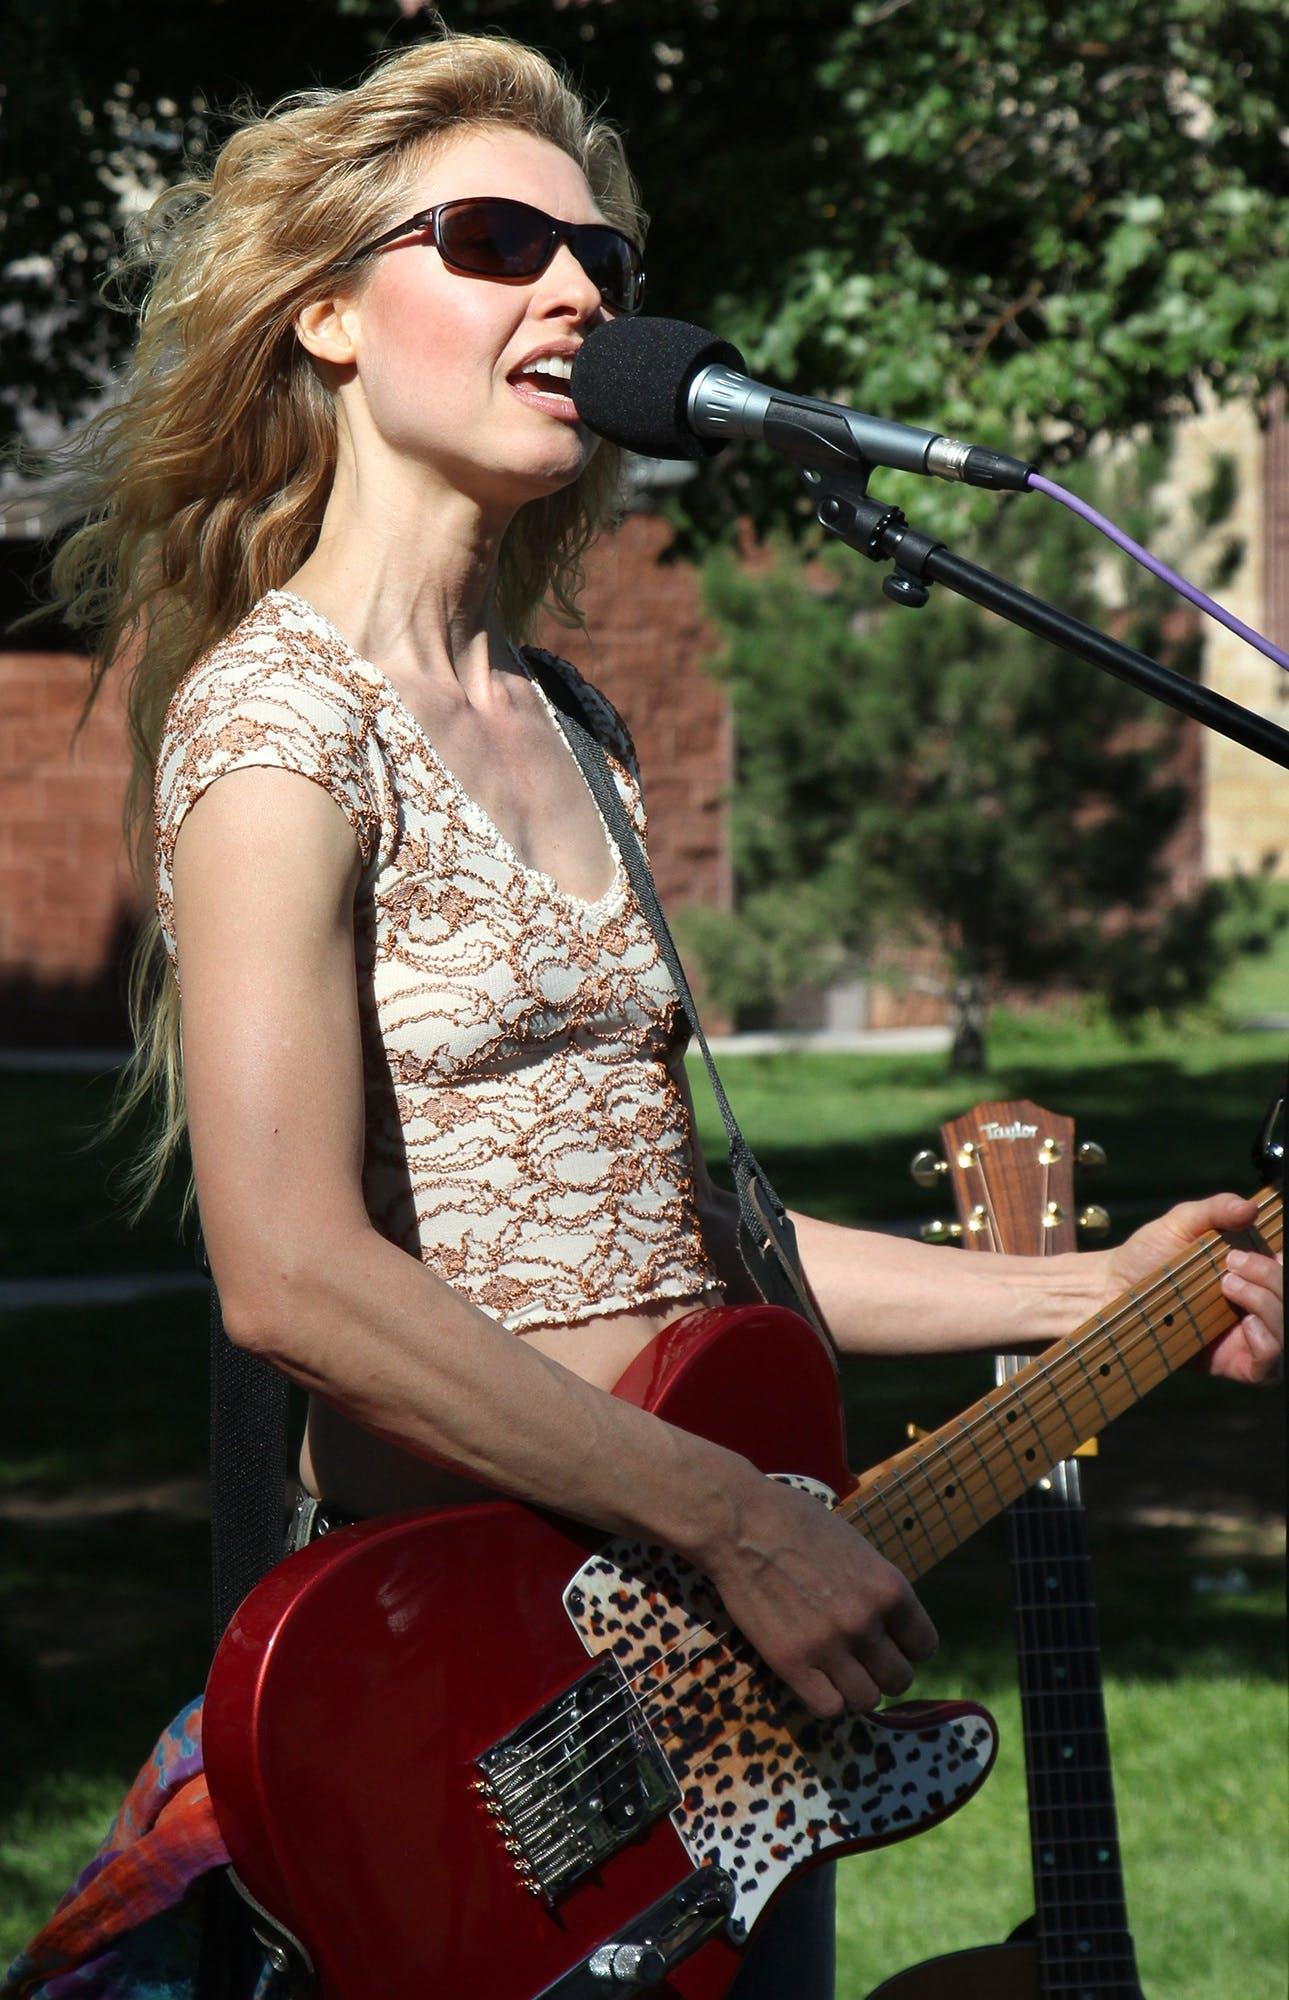 Free stock photo of woman, playing, musician, rock